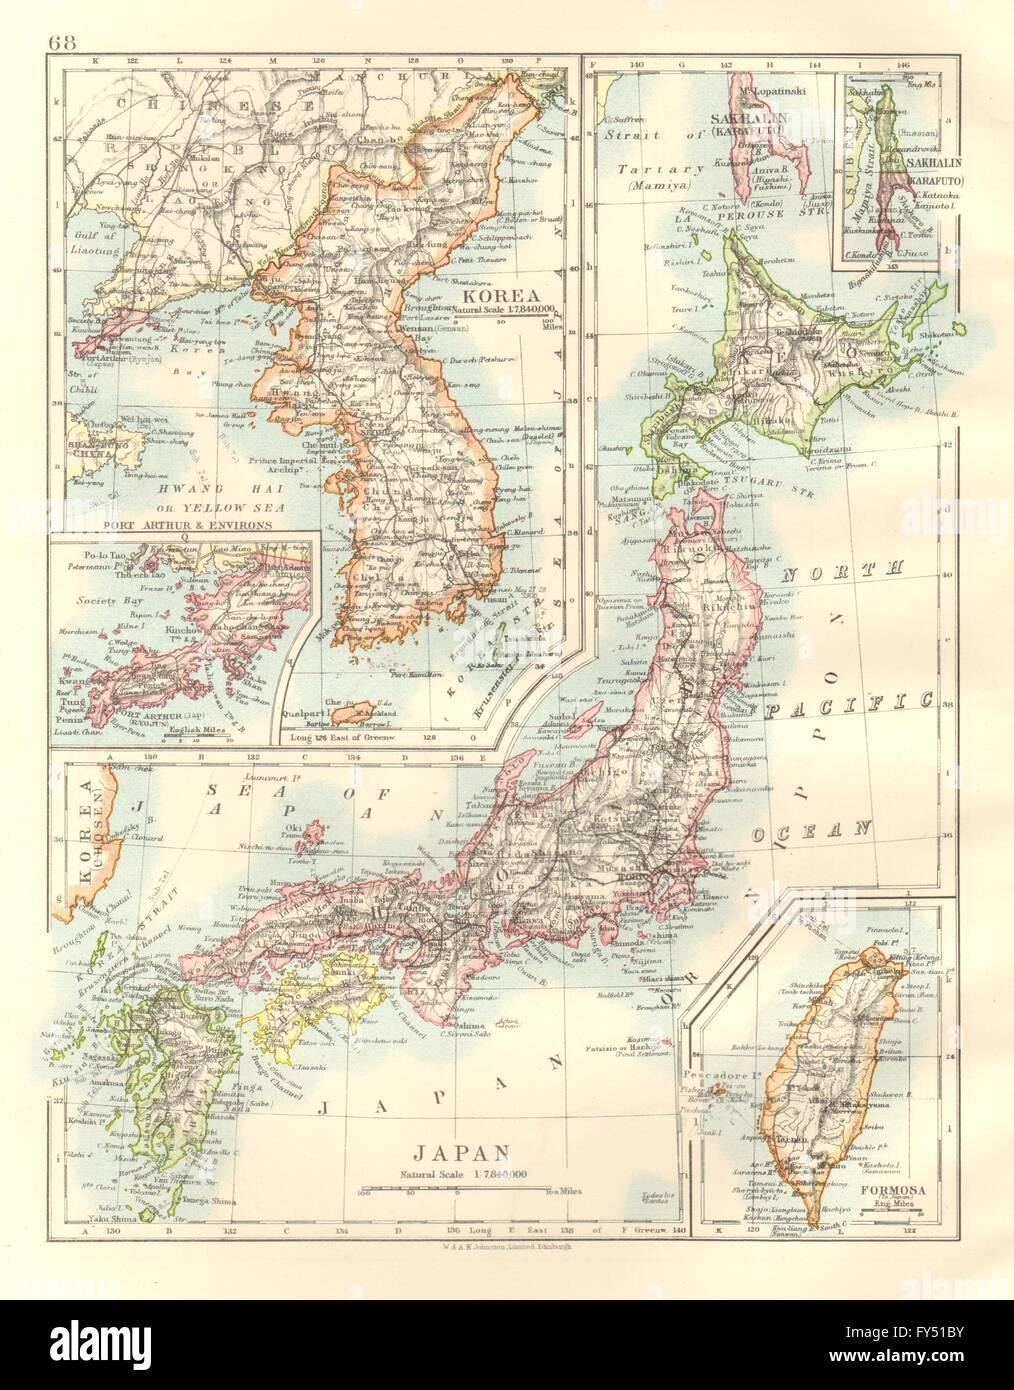 KOREA JAPAN FORMOSA Japanese Port Arthur Hachijo Penal Stock - Japan map 1920